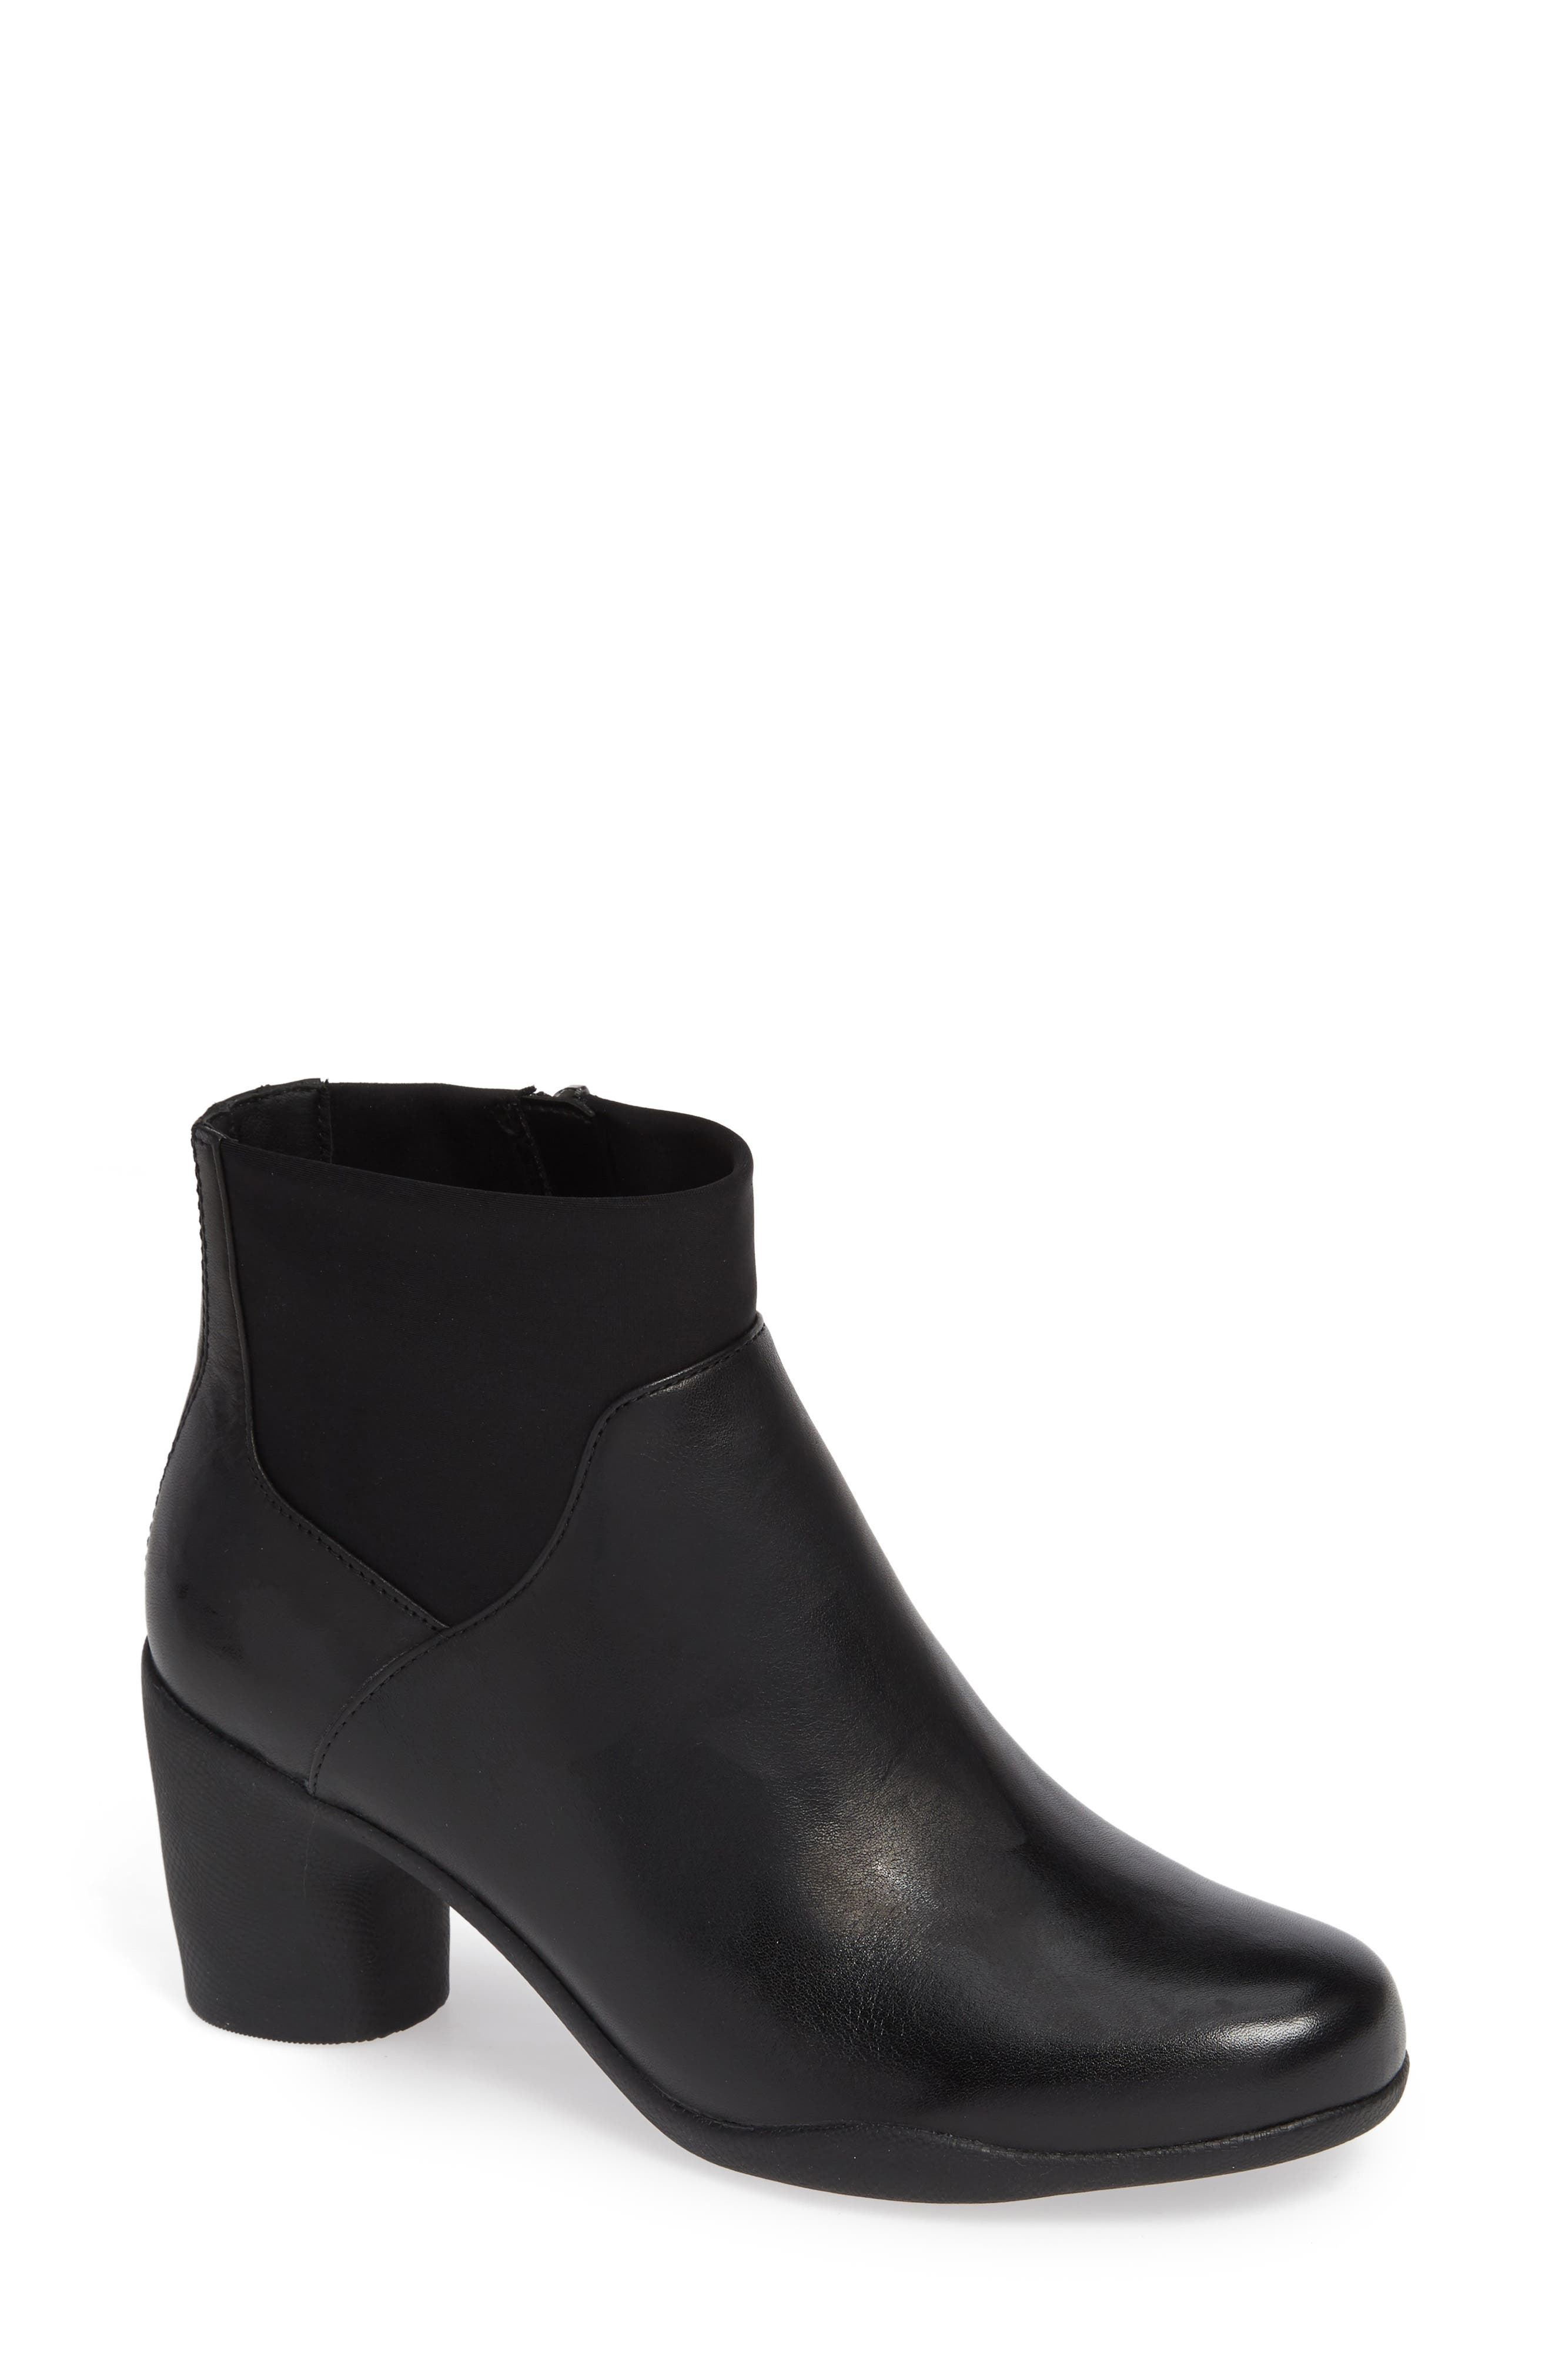 Clarks Un Rose Mid Ankle Boot- Black